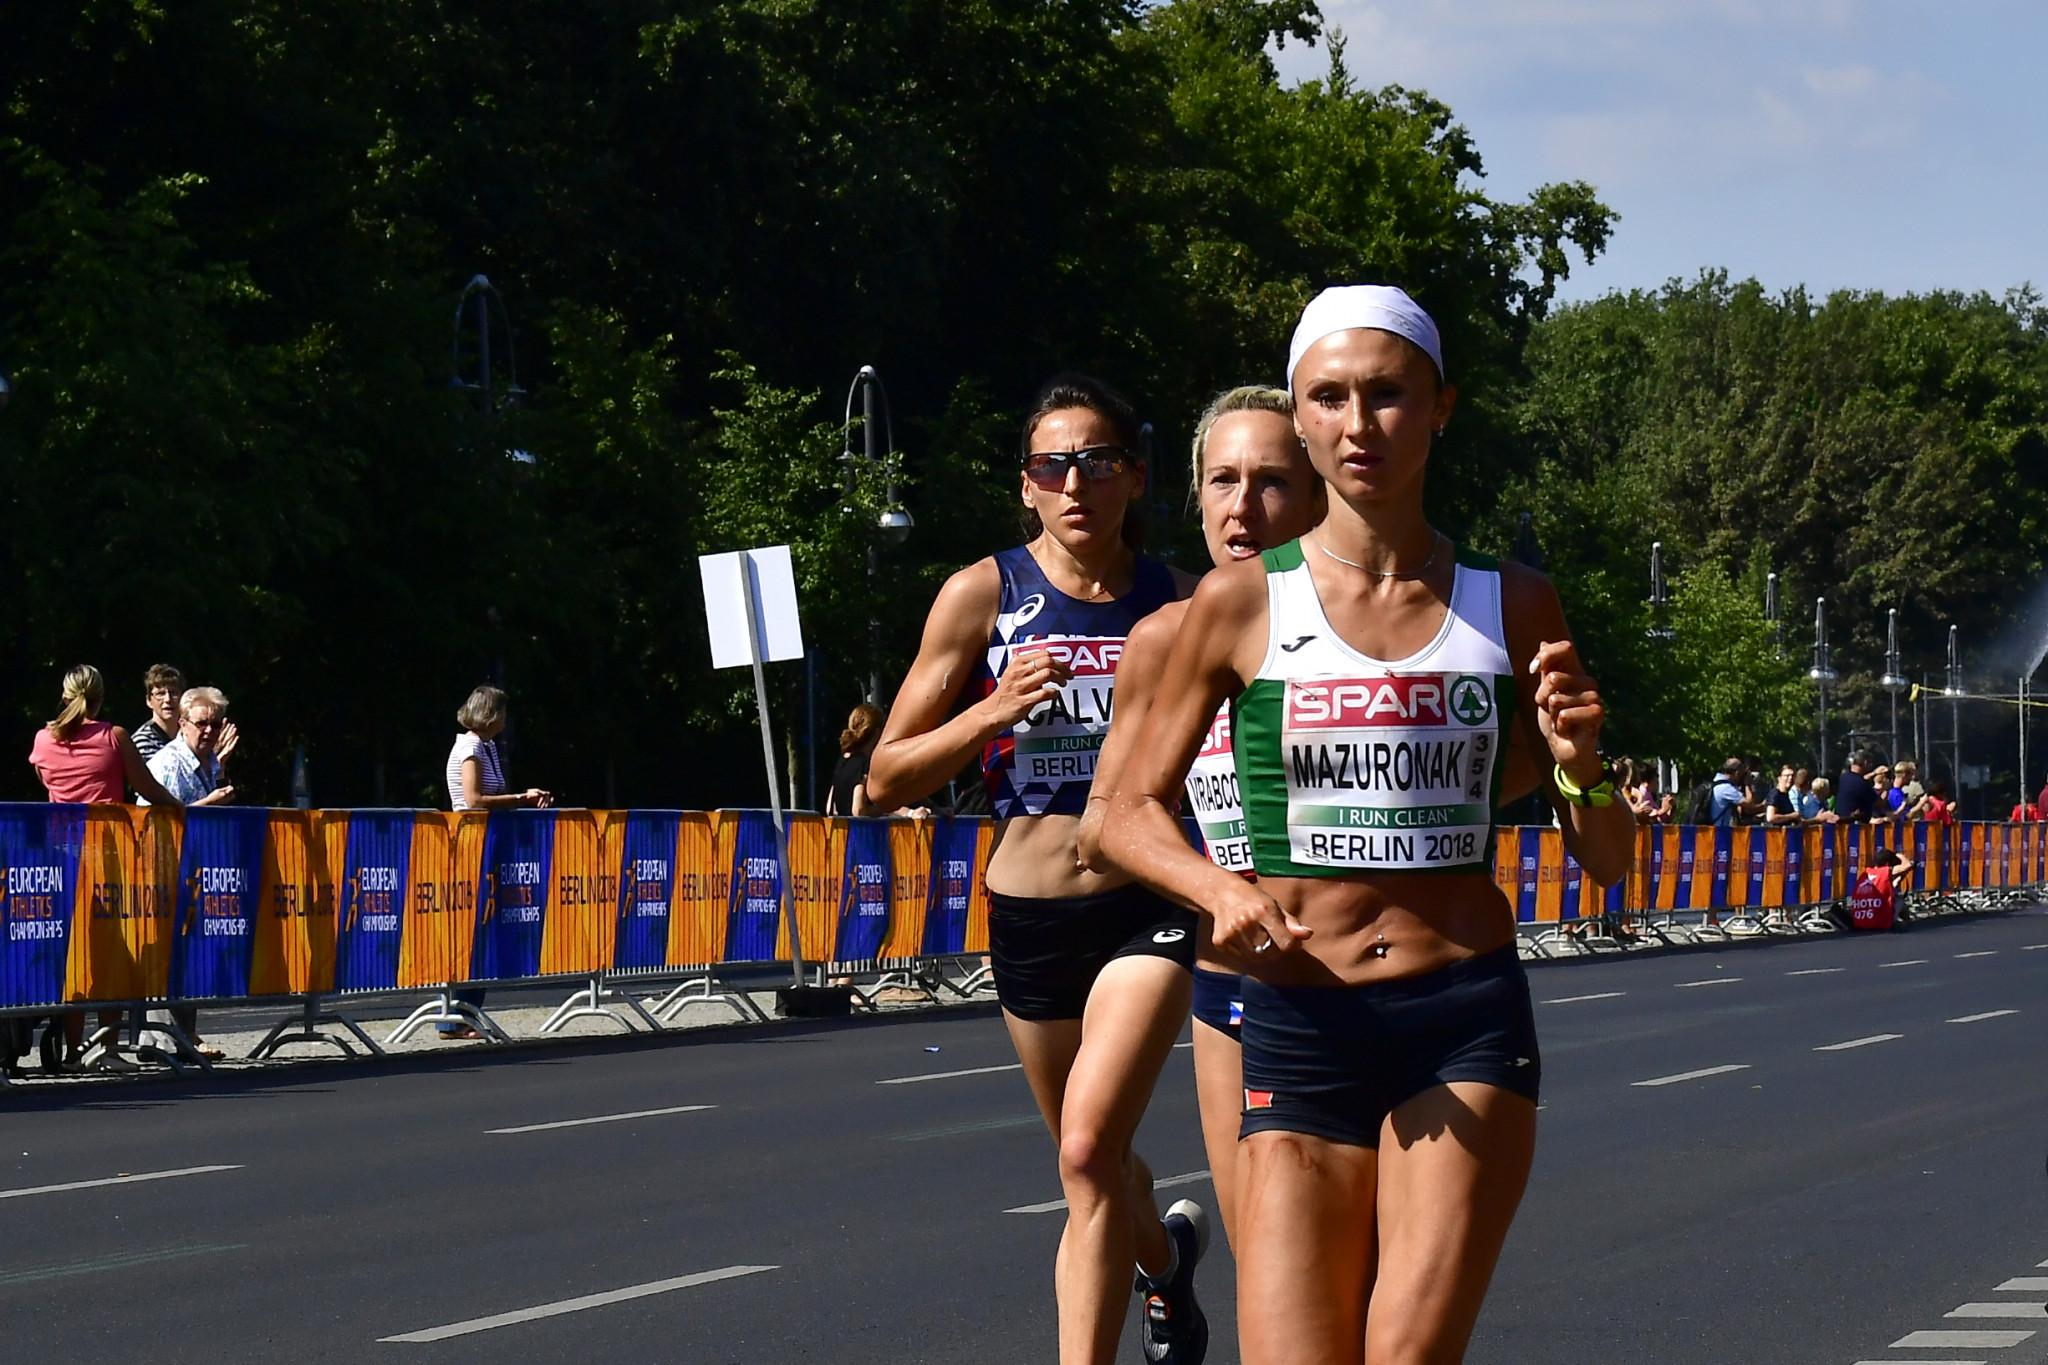 European marathon champion Volha Mazuronak has become the latest Minsk 2019 ambassador ©Getty Images